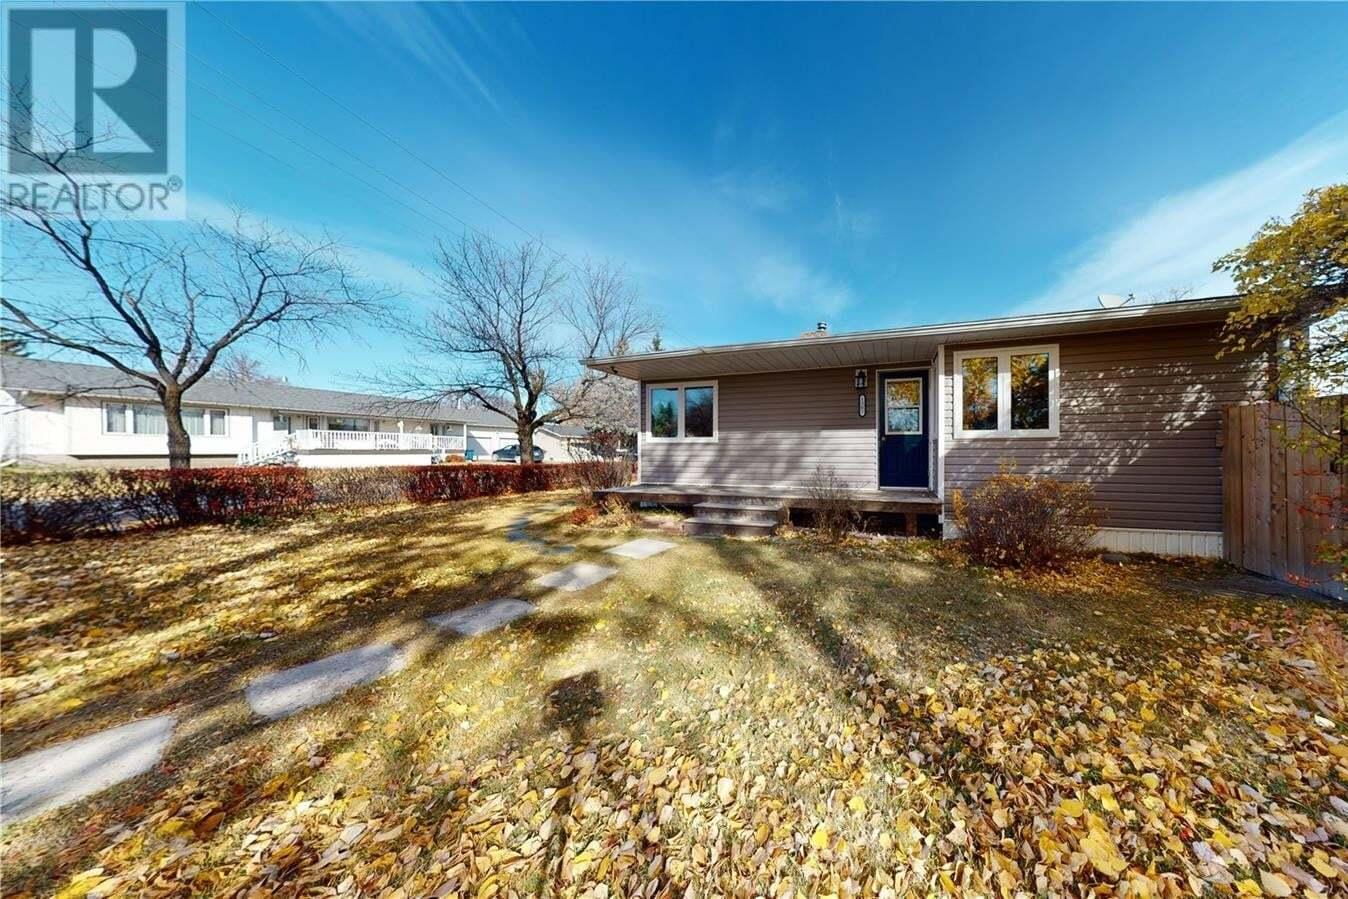 House for sale at 1302 Broadway Ave Moosomin Saskatchewan - MLS: SK830560